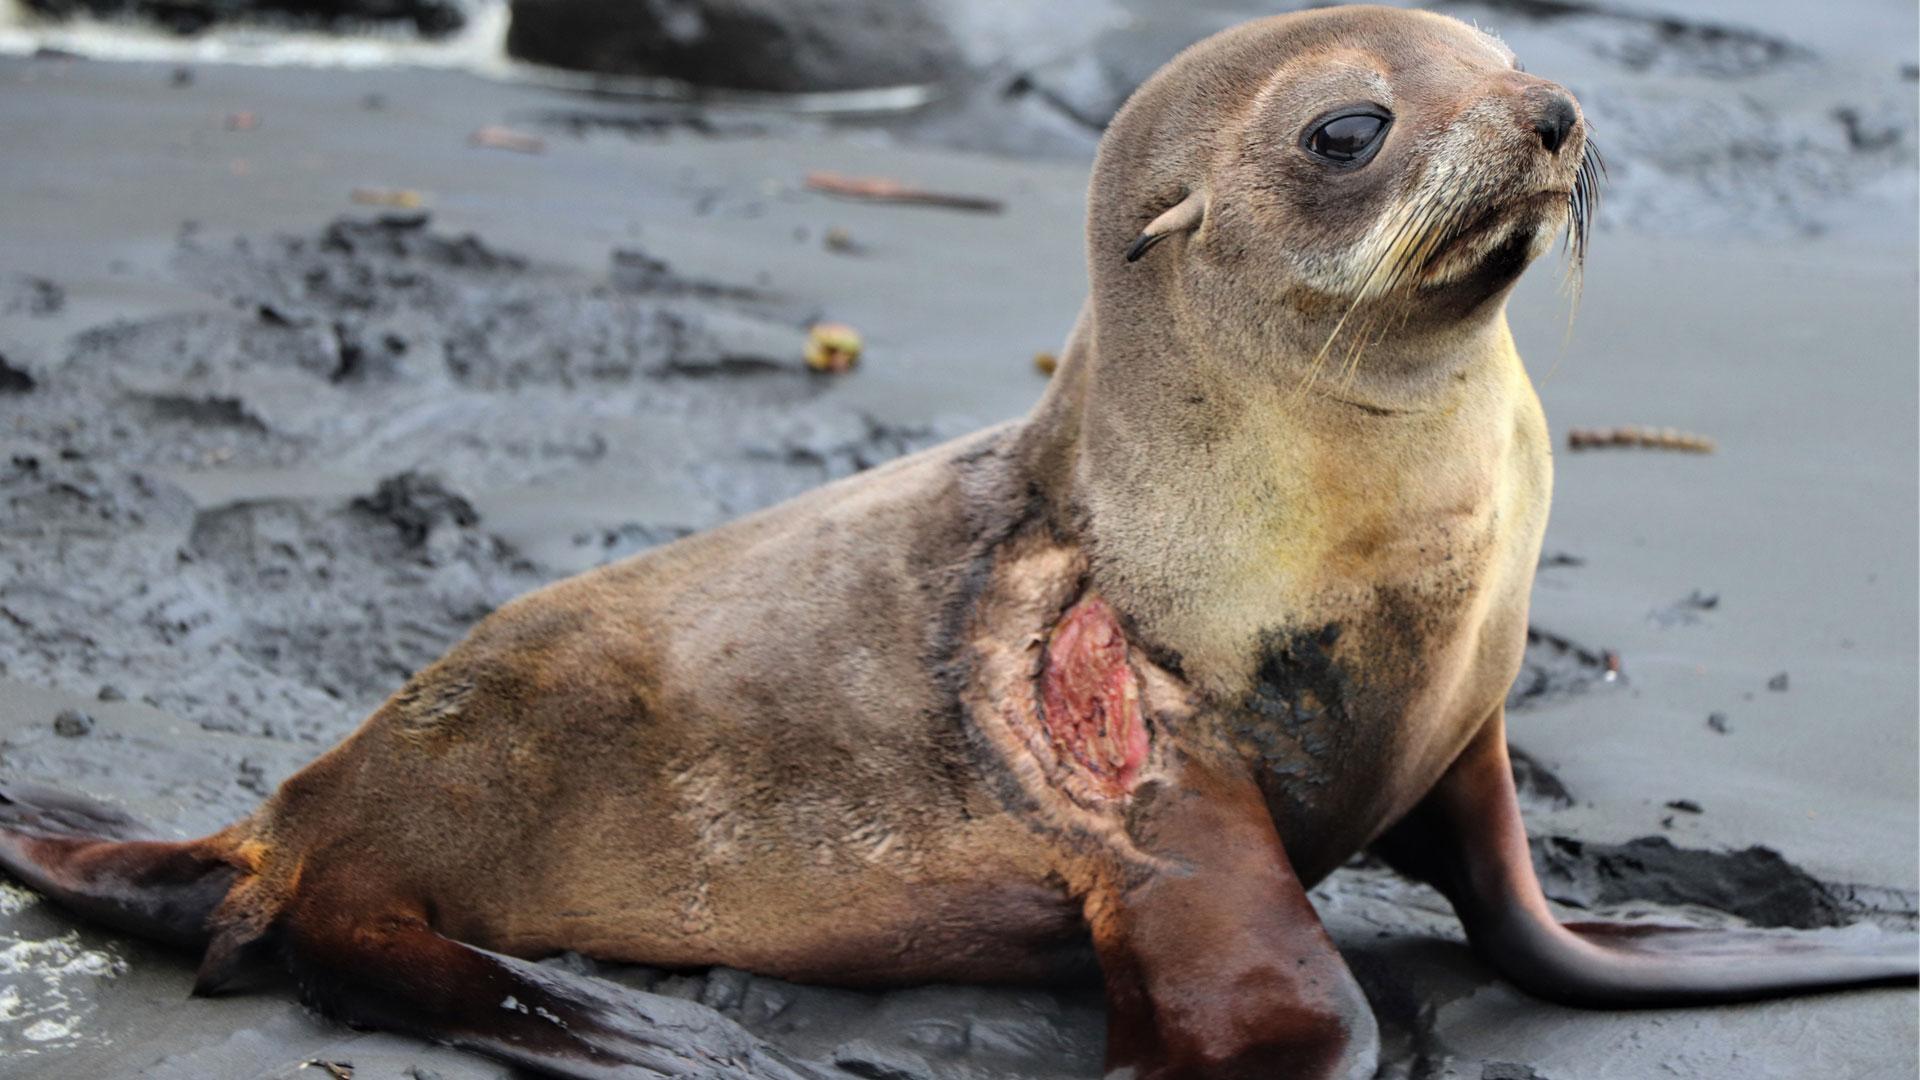 https://rfacdn.nz/zoo/assets/media/nz-fur-seal-gallery-3.jpg